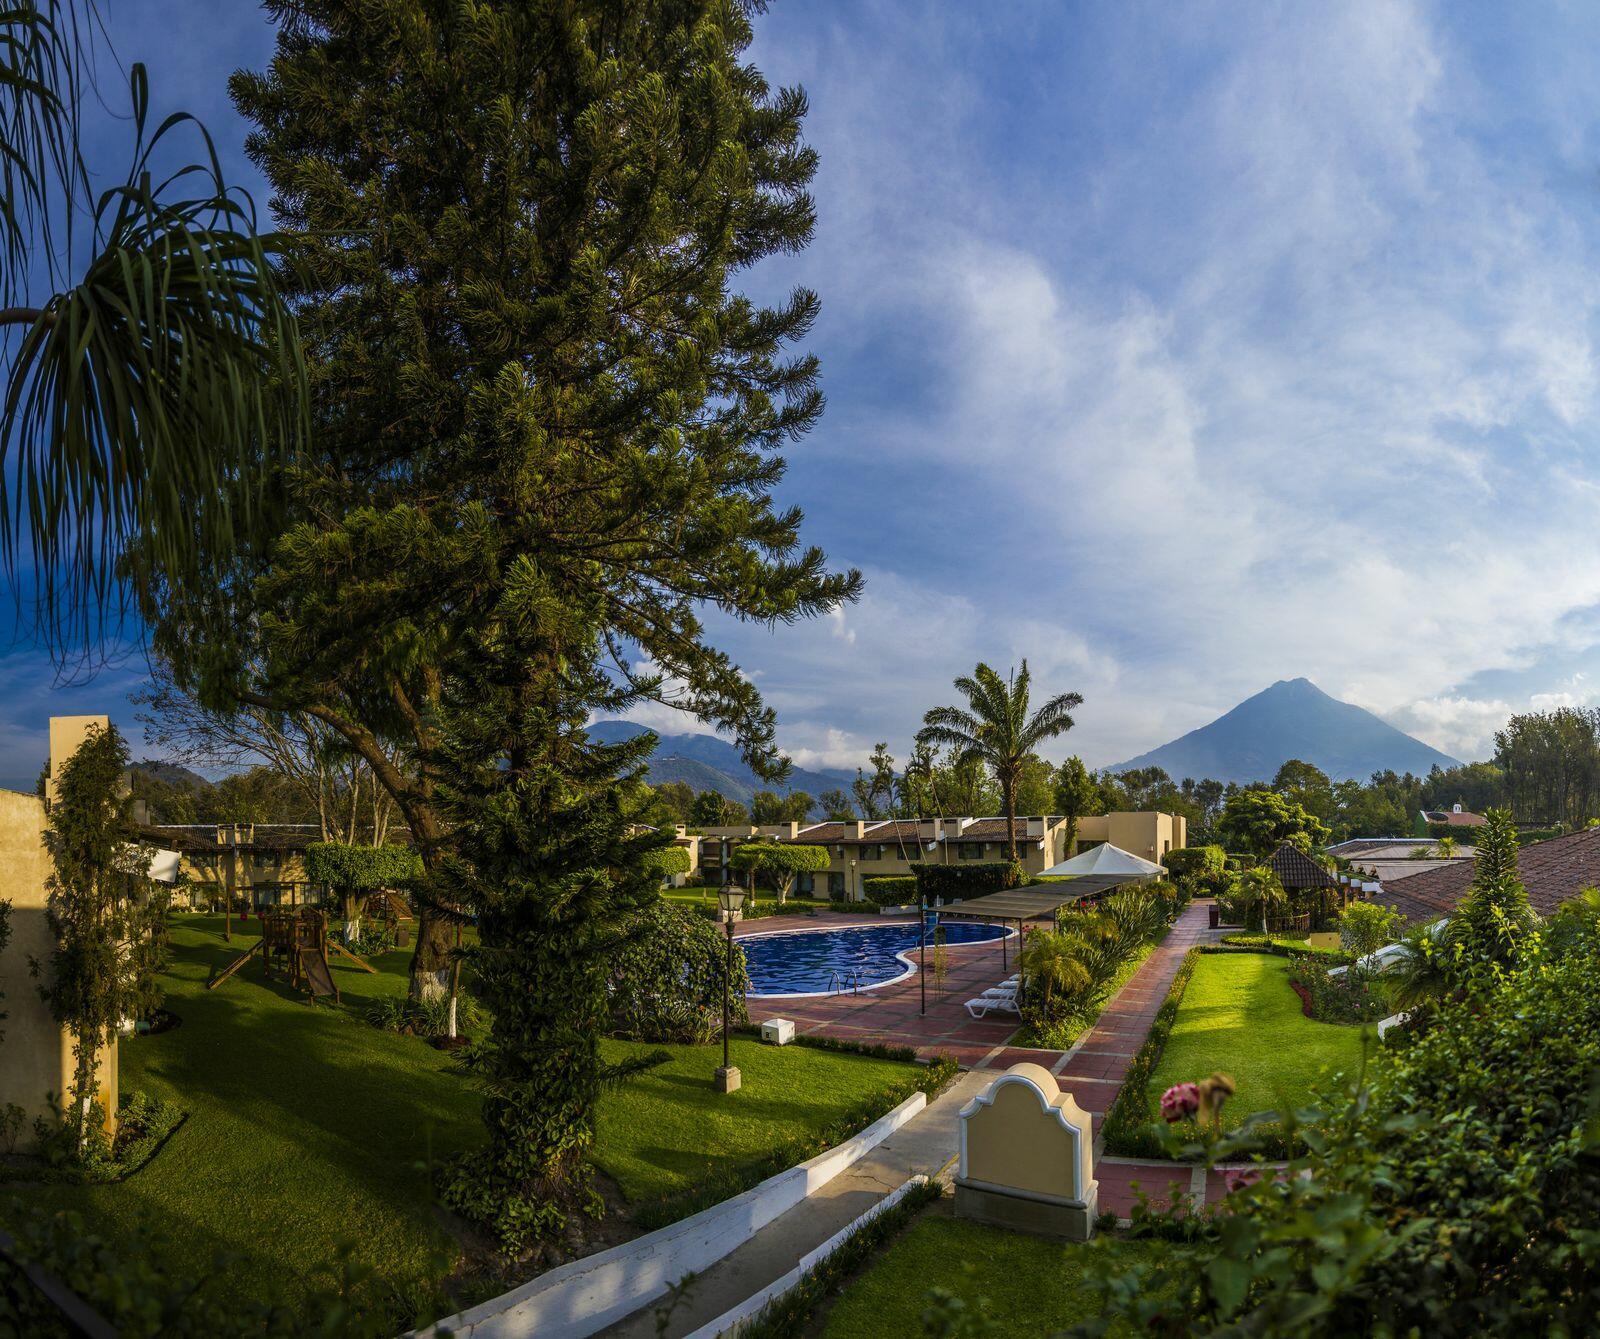 Hotel Soleil La Antigua logotipo xterior